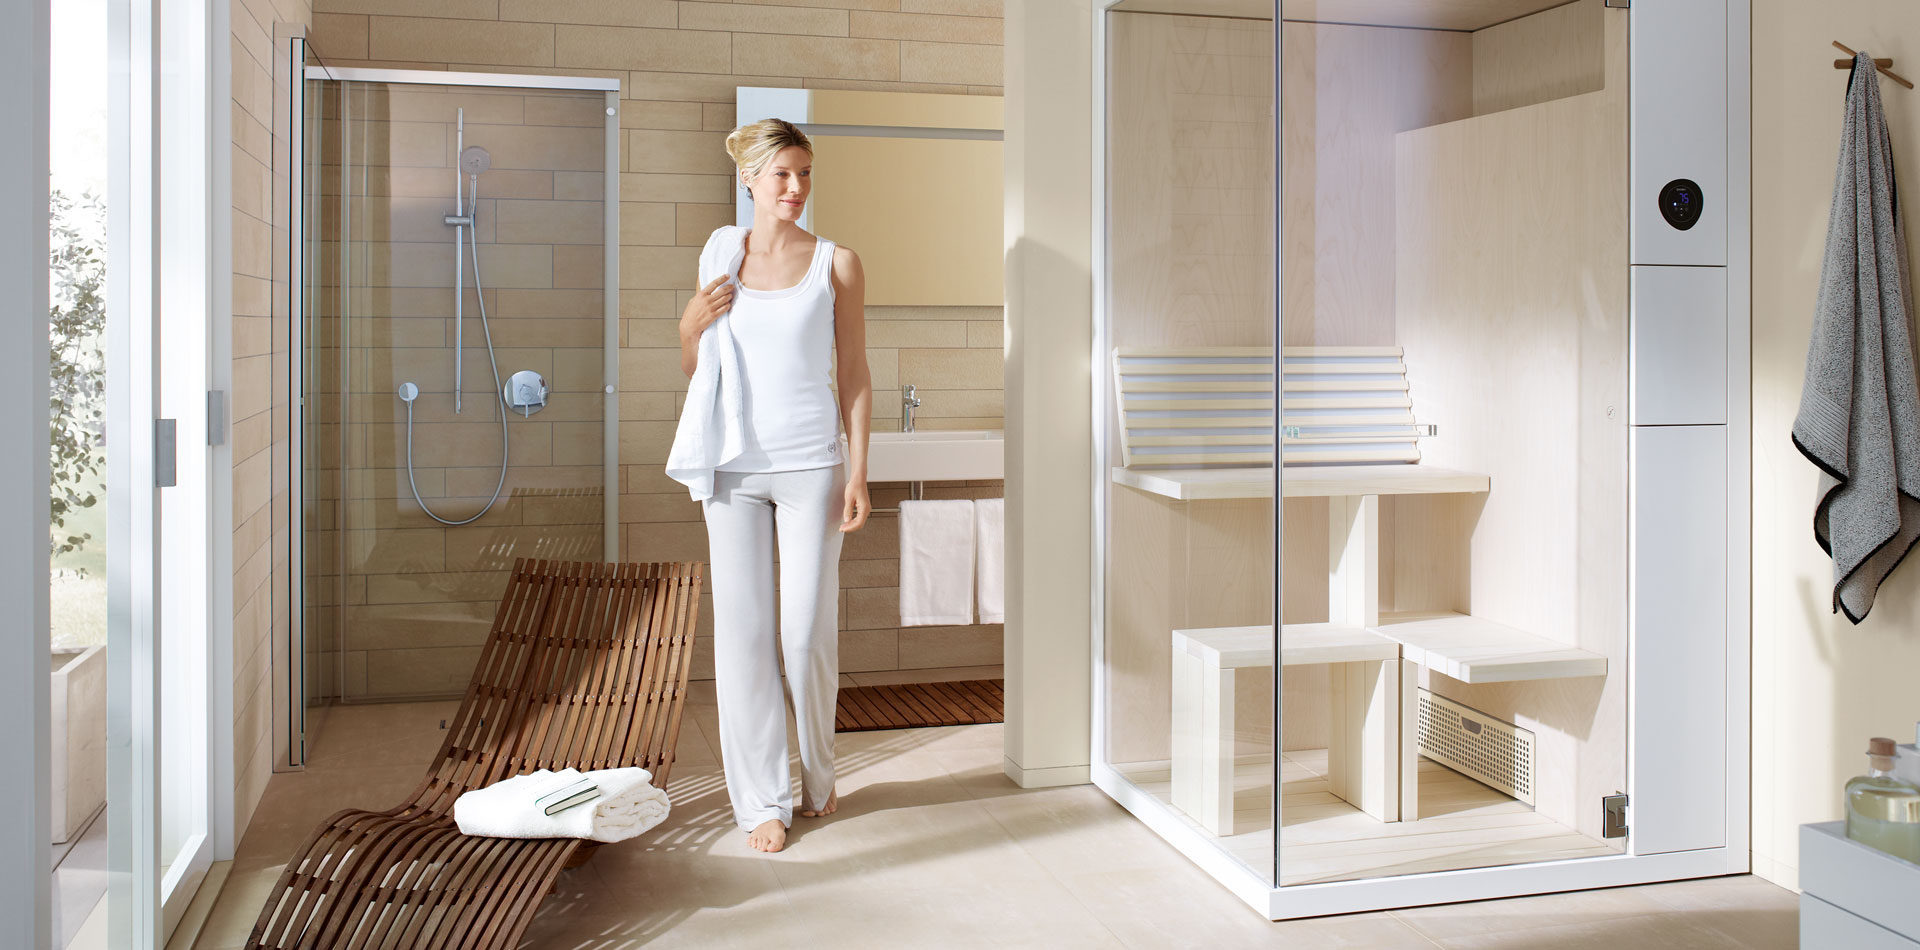 Badezimmer Komplett Service, Traumbad 4 You, Dusche barrierefrei